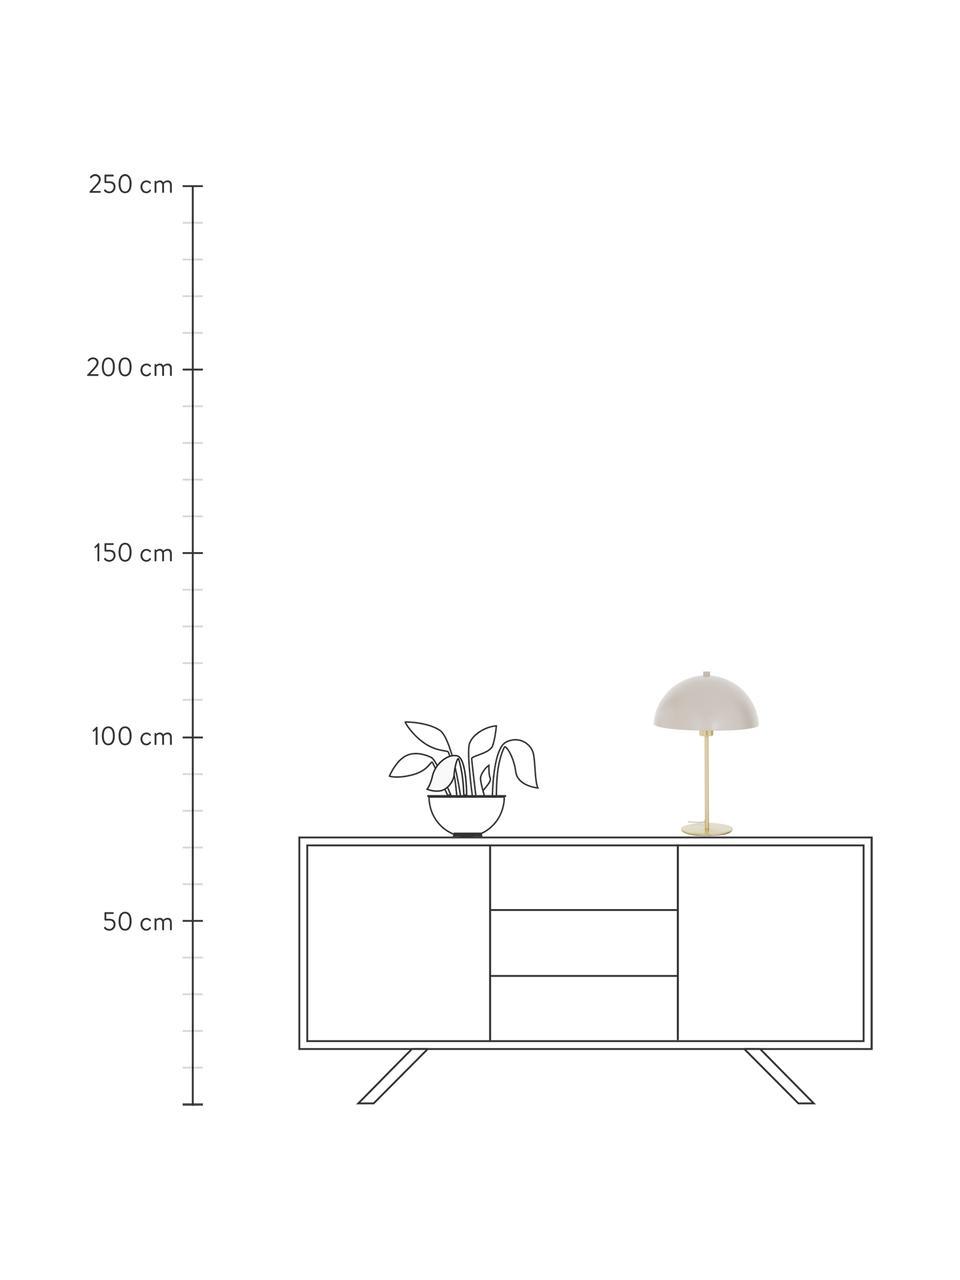 Tafellamp Matilda van metaal, Lampenkap: gepoedercoat metaal, Lampvoet: vermessingd metaal, Taupe, messingkleurig, Ø 29 x H 45 cm